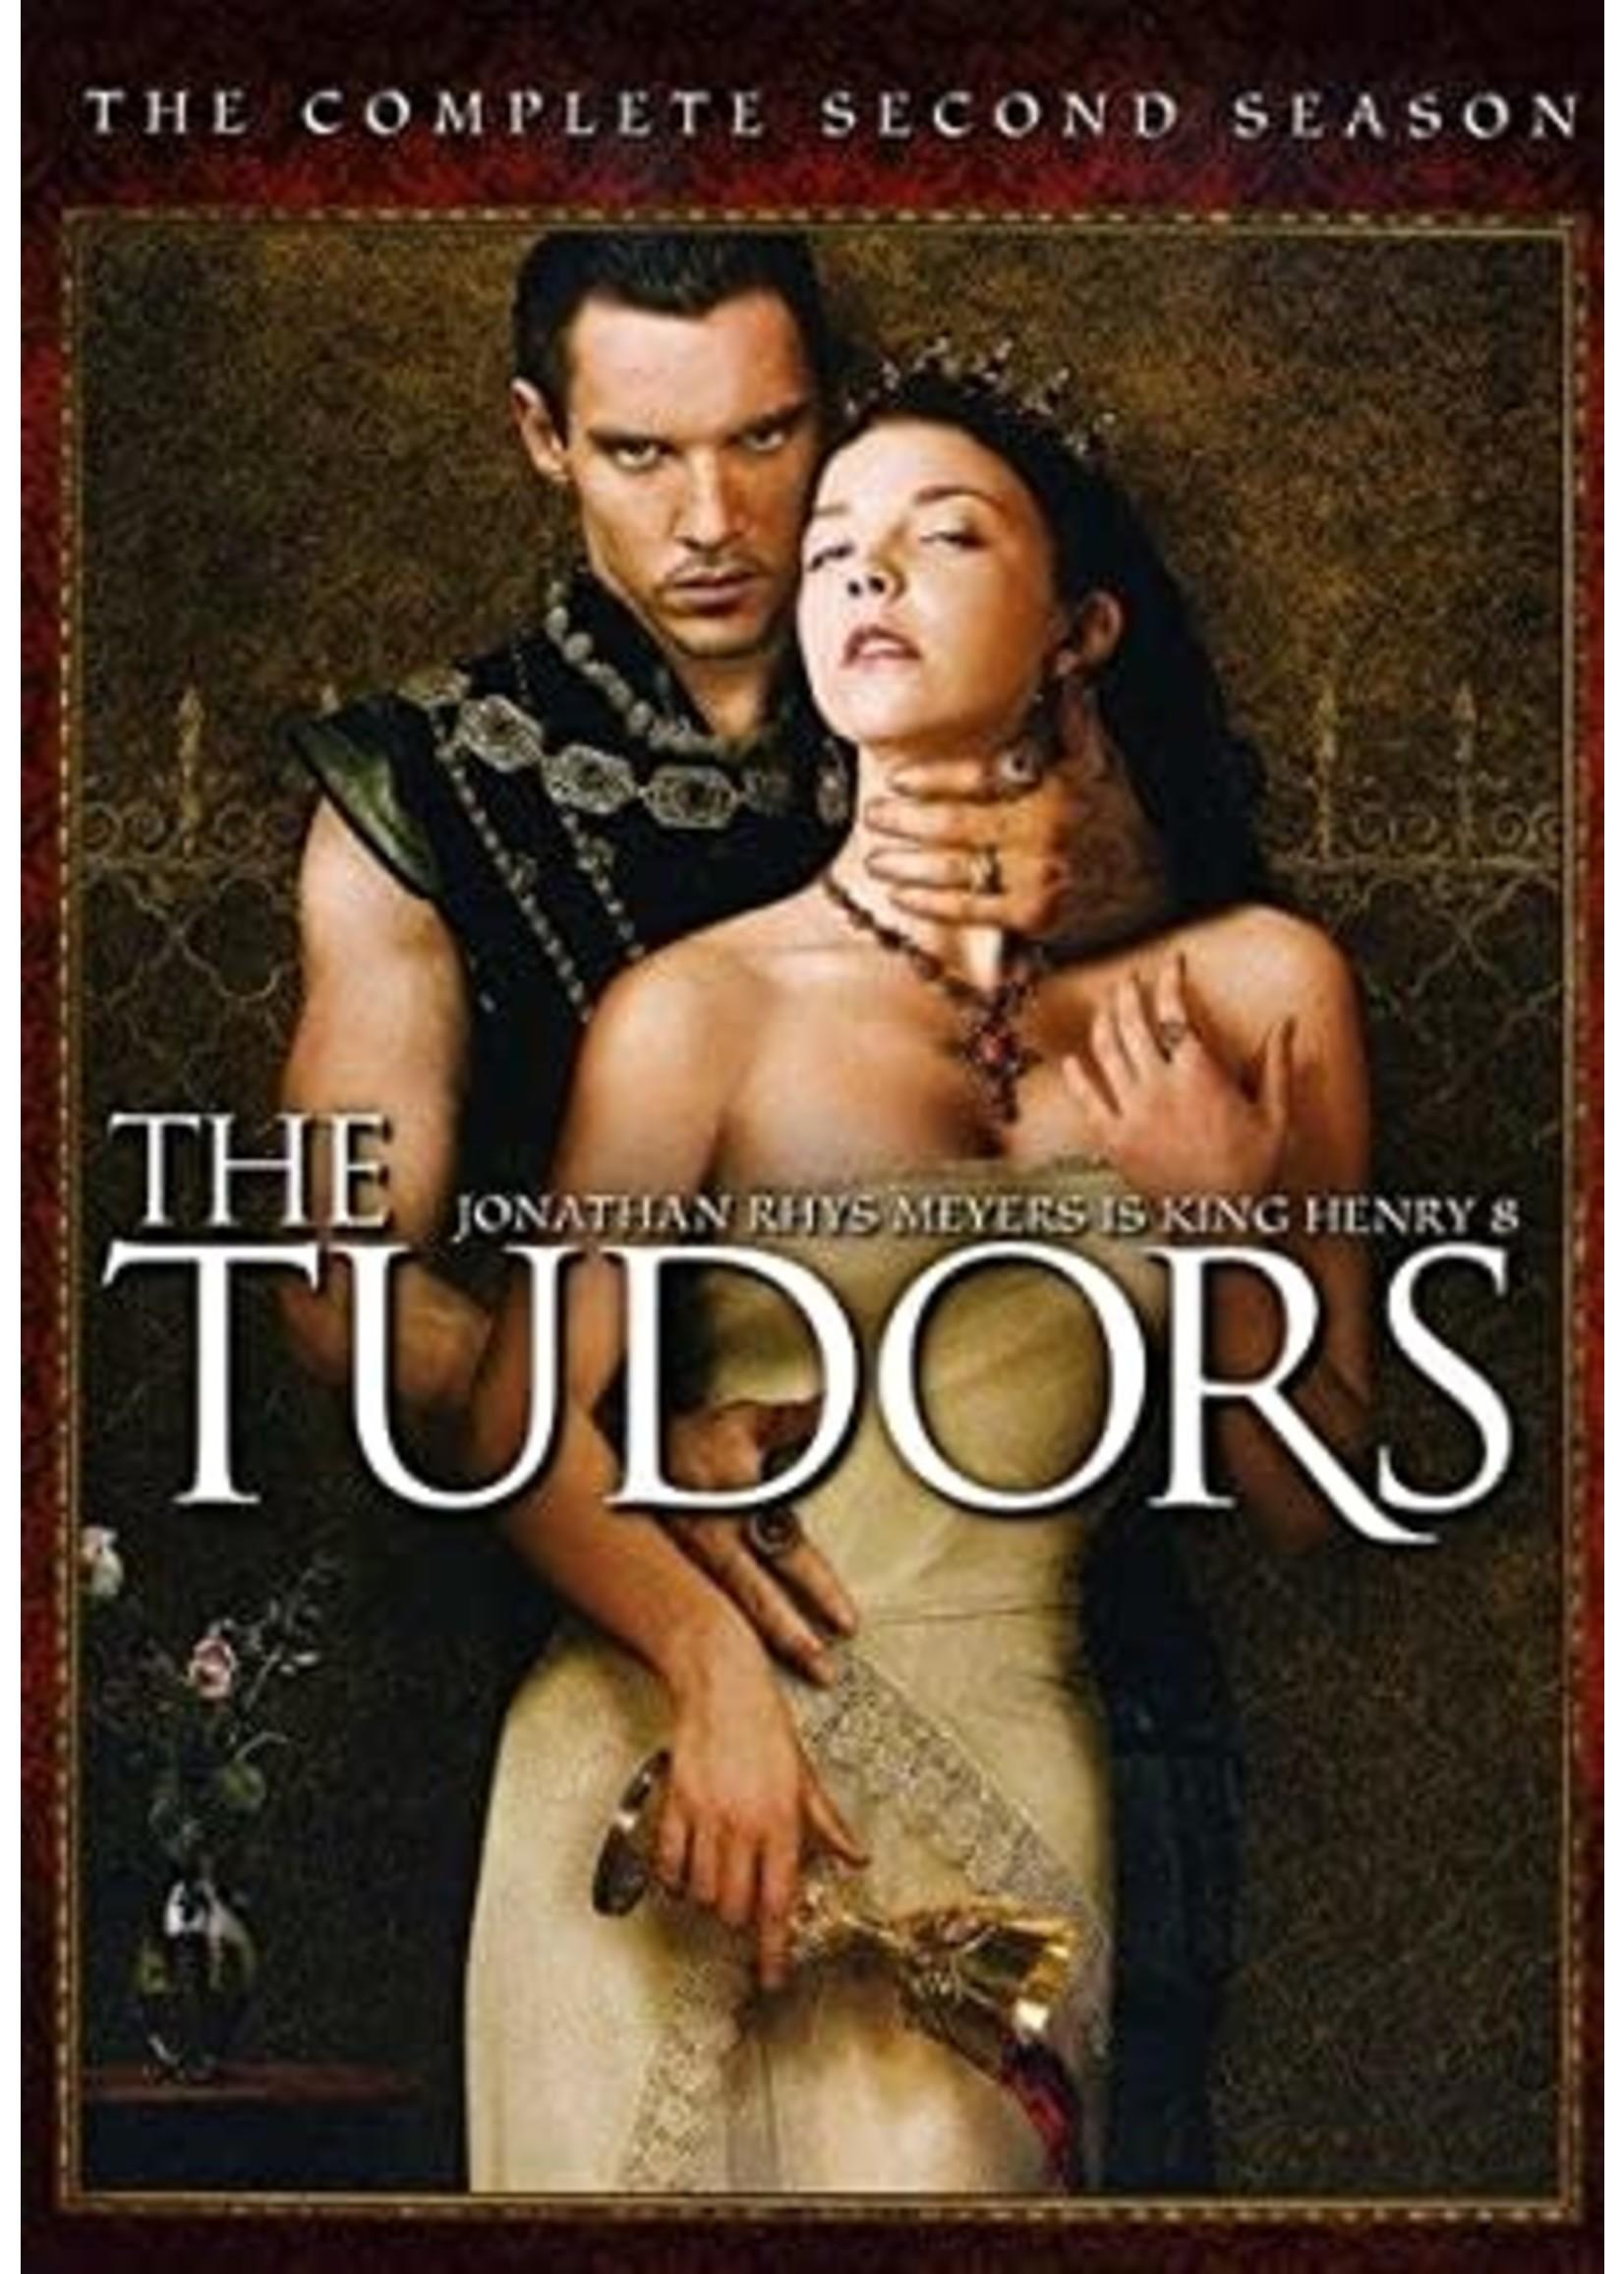 The Tudors: Season 2 DVD